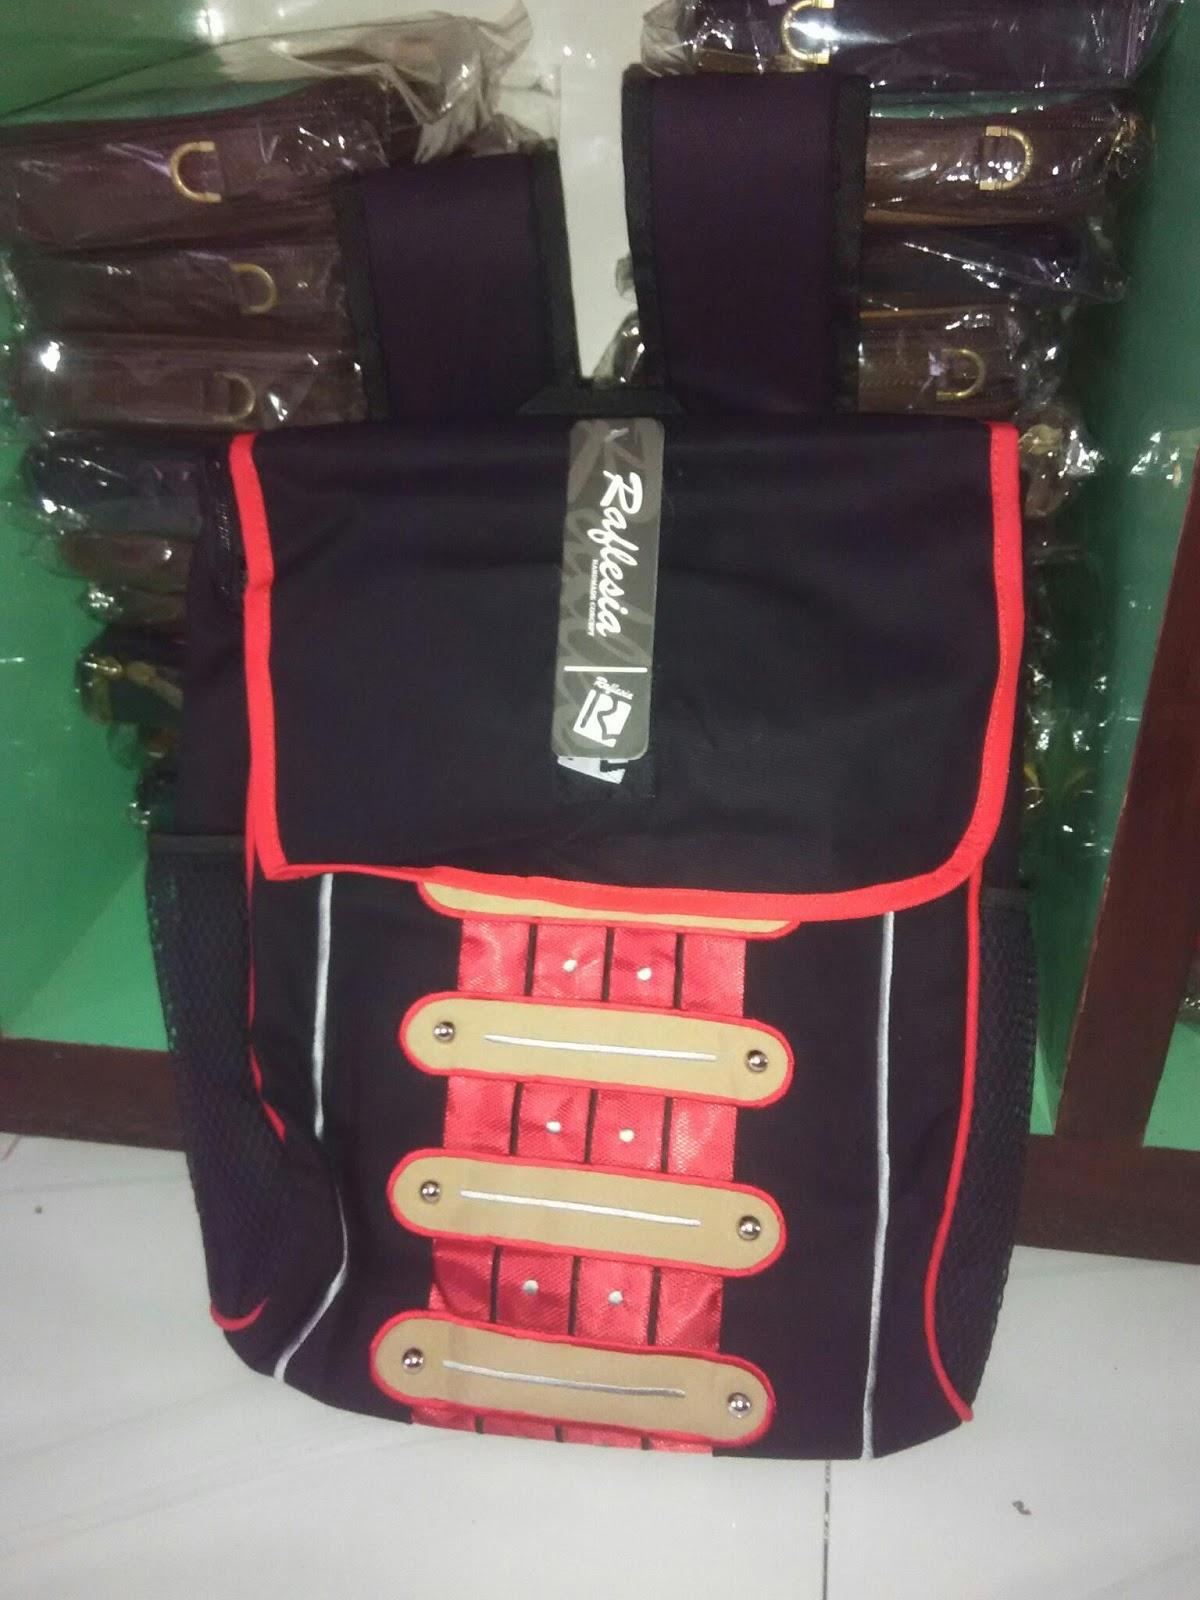 Tas Sekolah Ransel Anak SD Kelas 456 Ready Stok Distributor Raflesia Surabaya